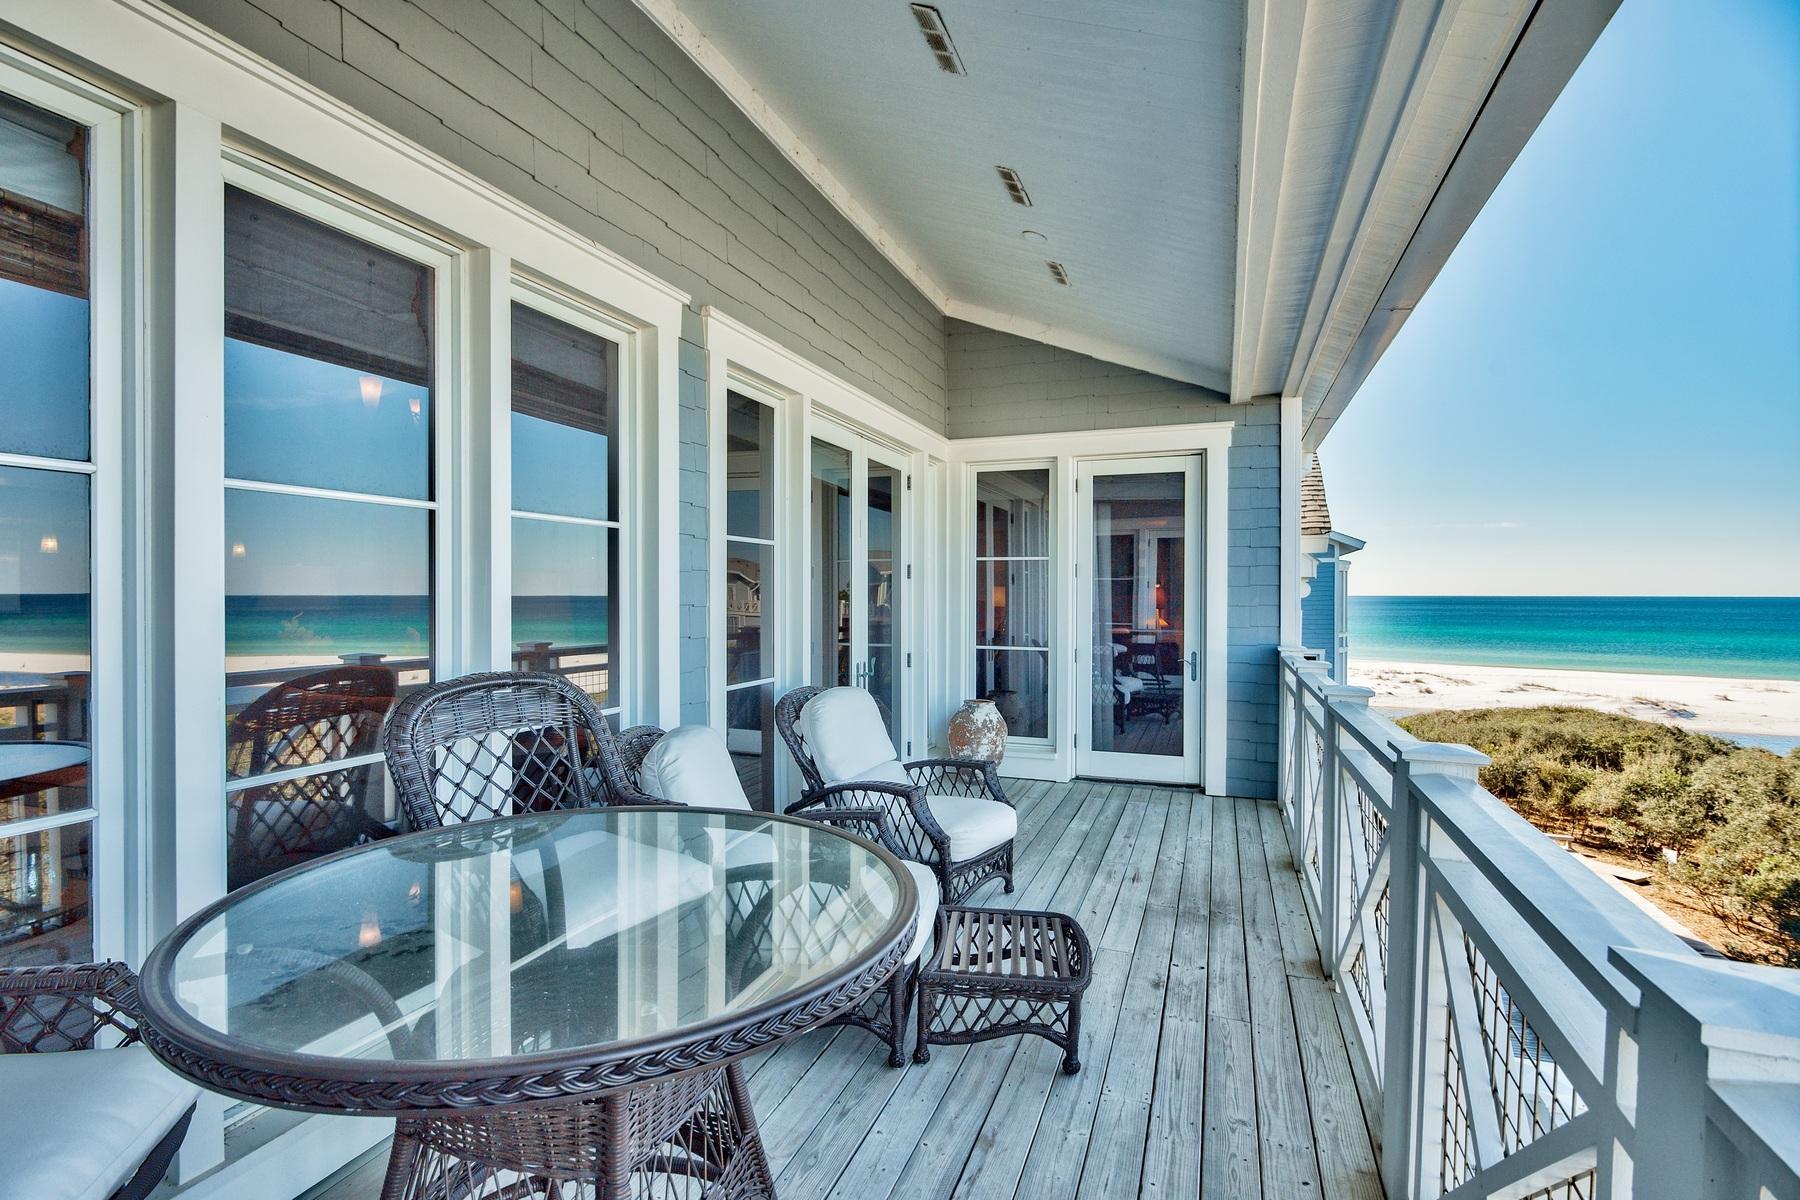 100 Bridge,Watersound,Florida 32461,3 Bedrooms Bedrooms,3 BathroomsBathrooms,Condominium,Bridge,20131126143817002353000000